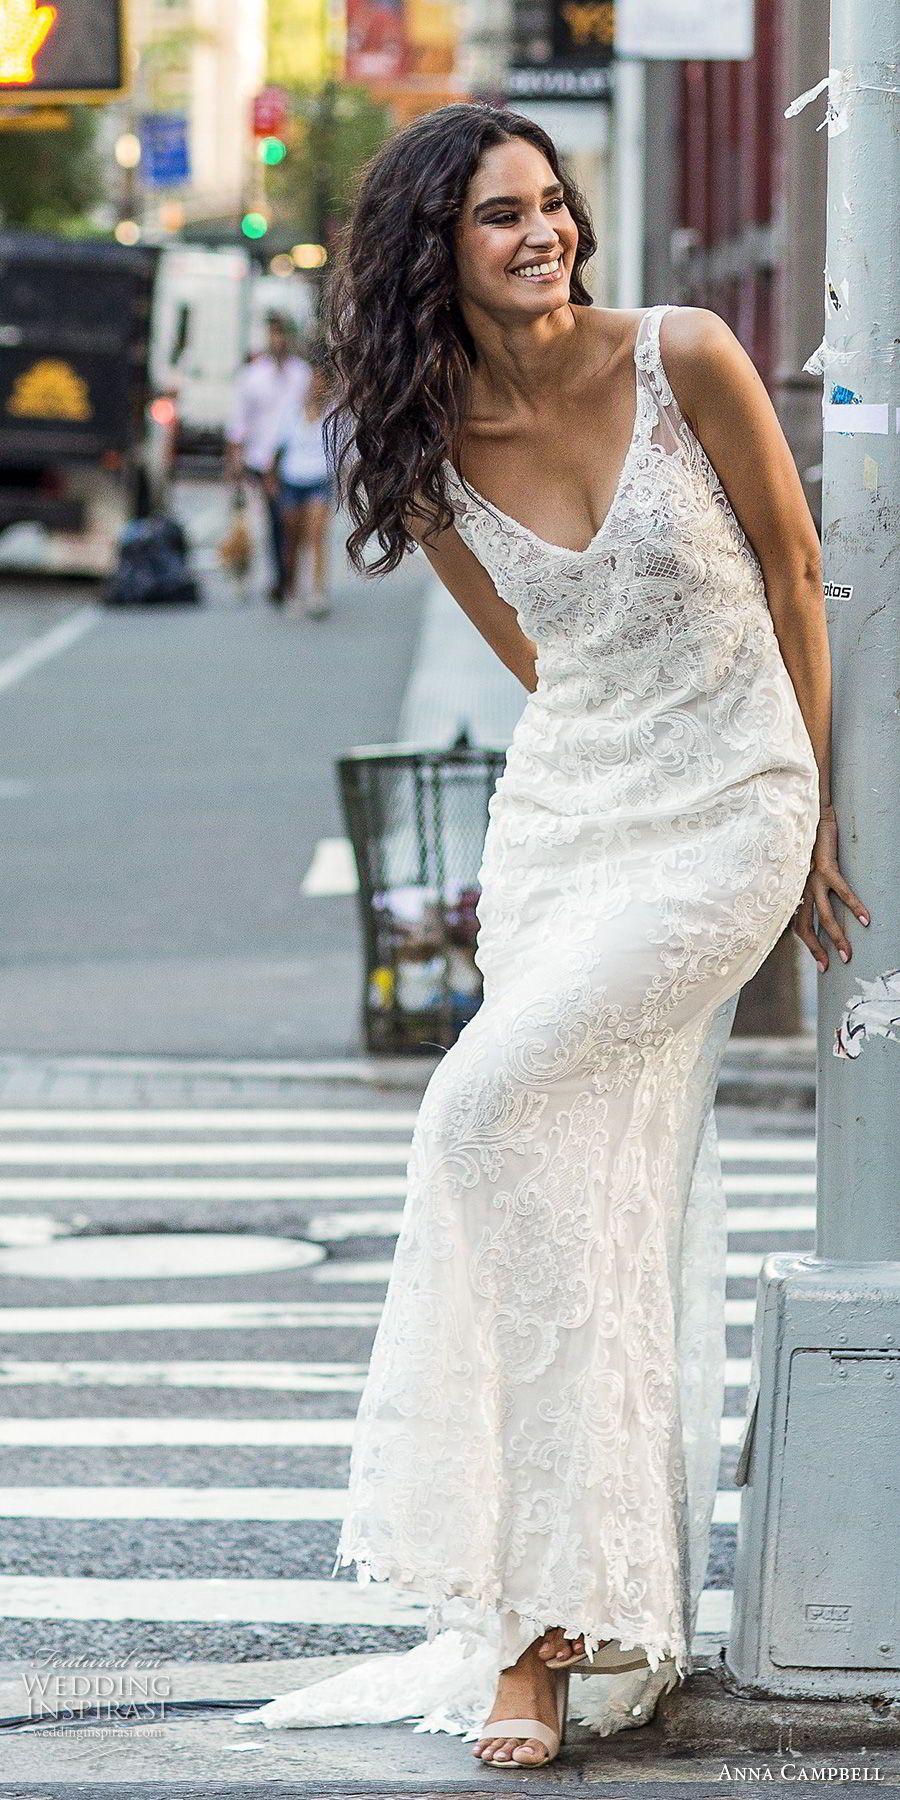 Anna Campbell Fall 2018 Wedding Dresses | Boda civil, Casamiento y ...